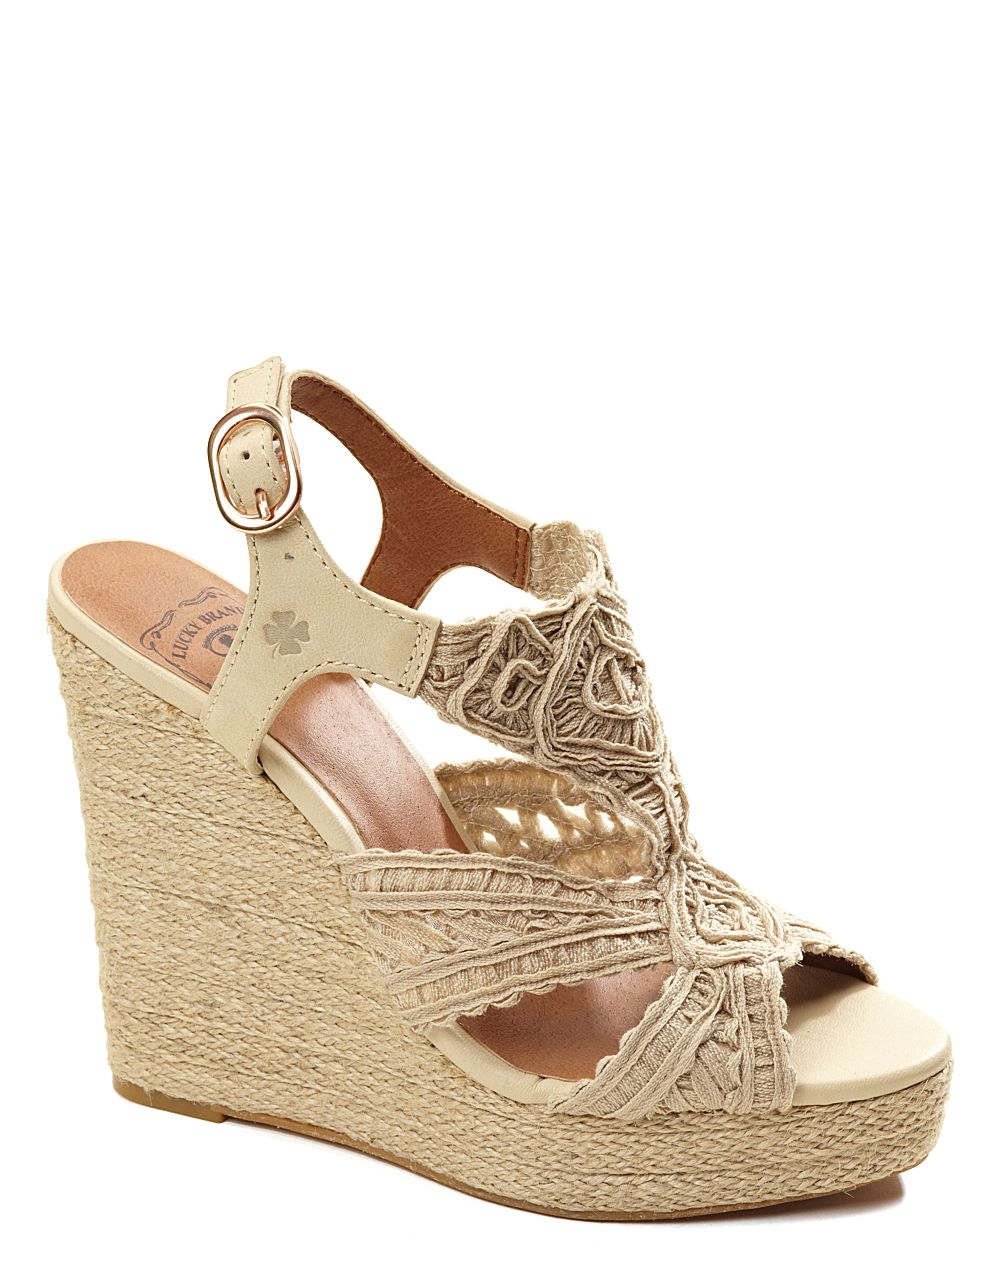 lucky brand ridgeview wedge sandals in beige buff lyst